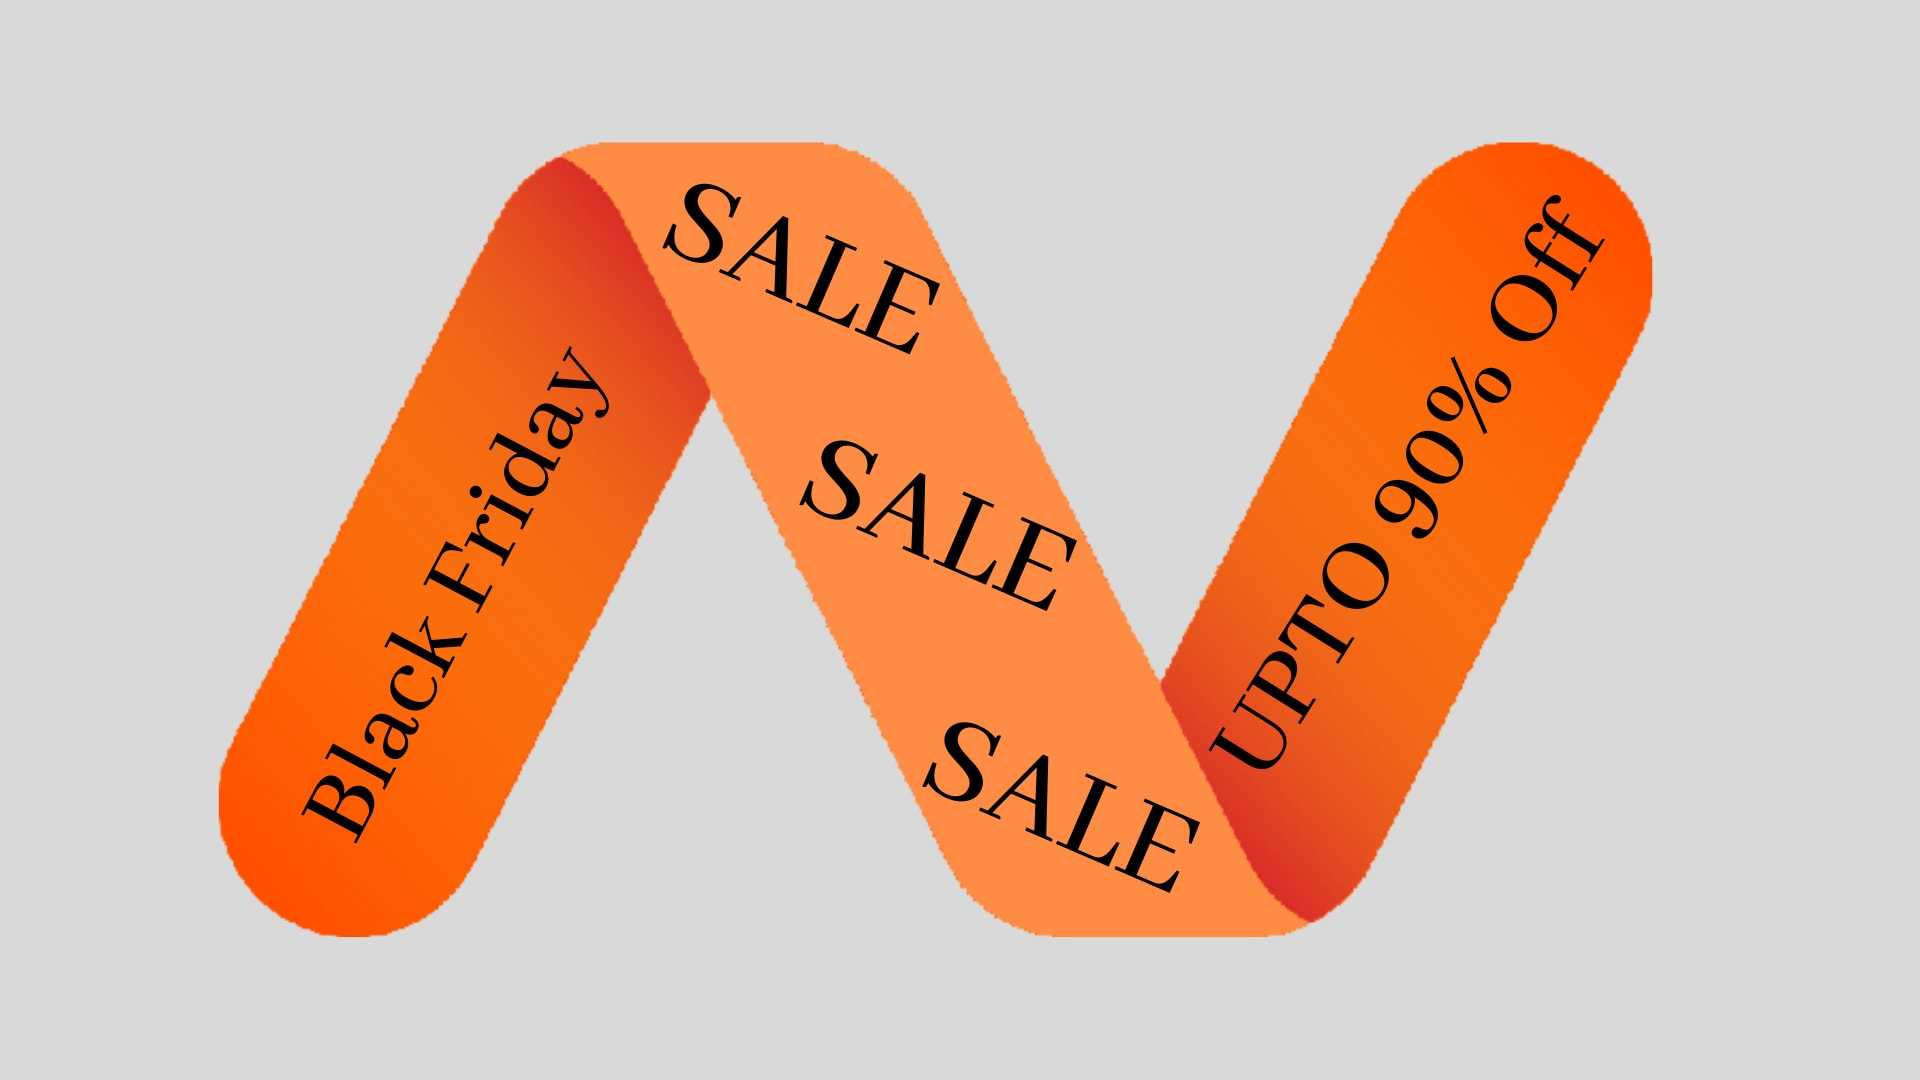 Namecheap Black Friday Sale 2020 - Namecheap Black Friday Sale 2020 [Flat 99% off]